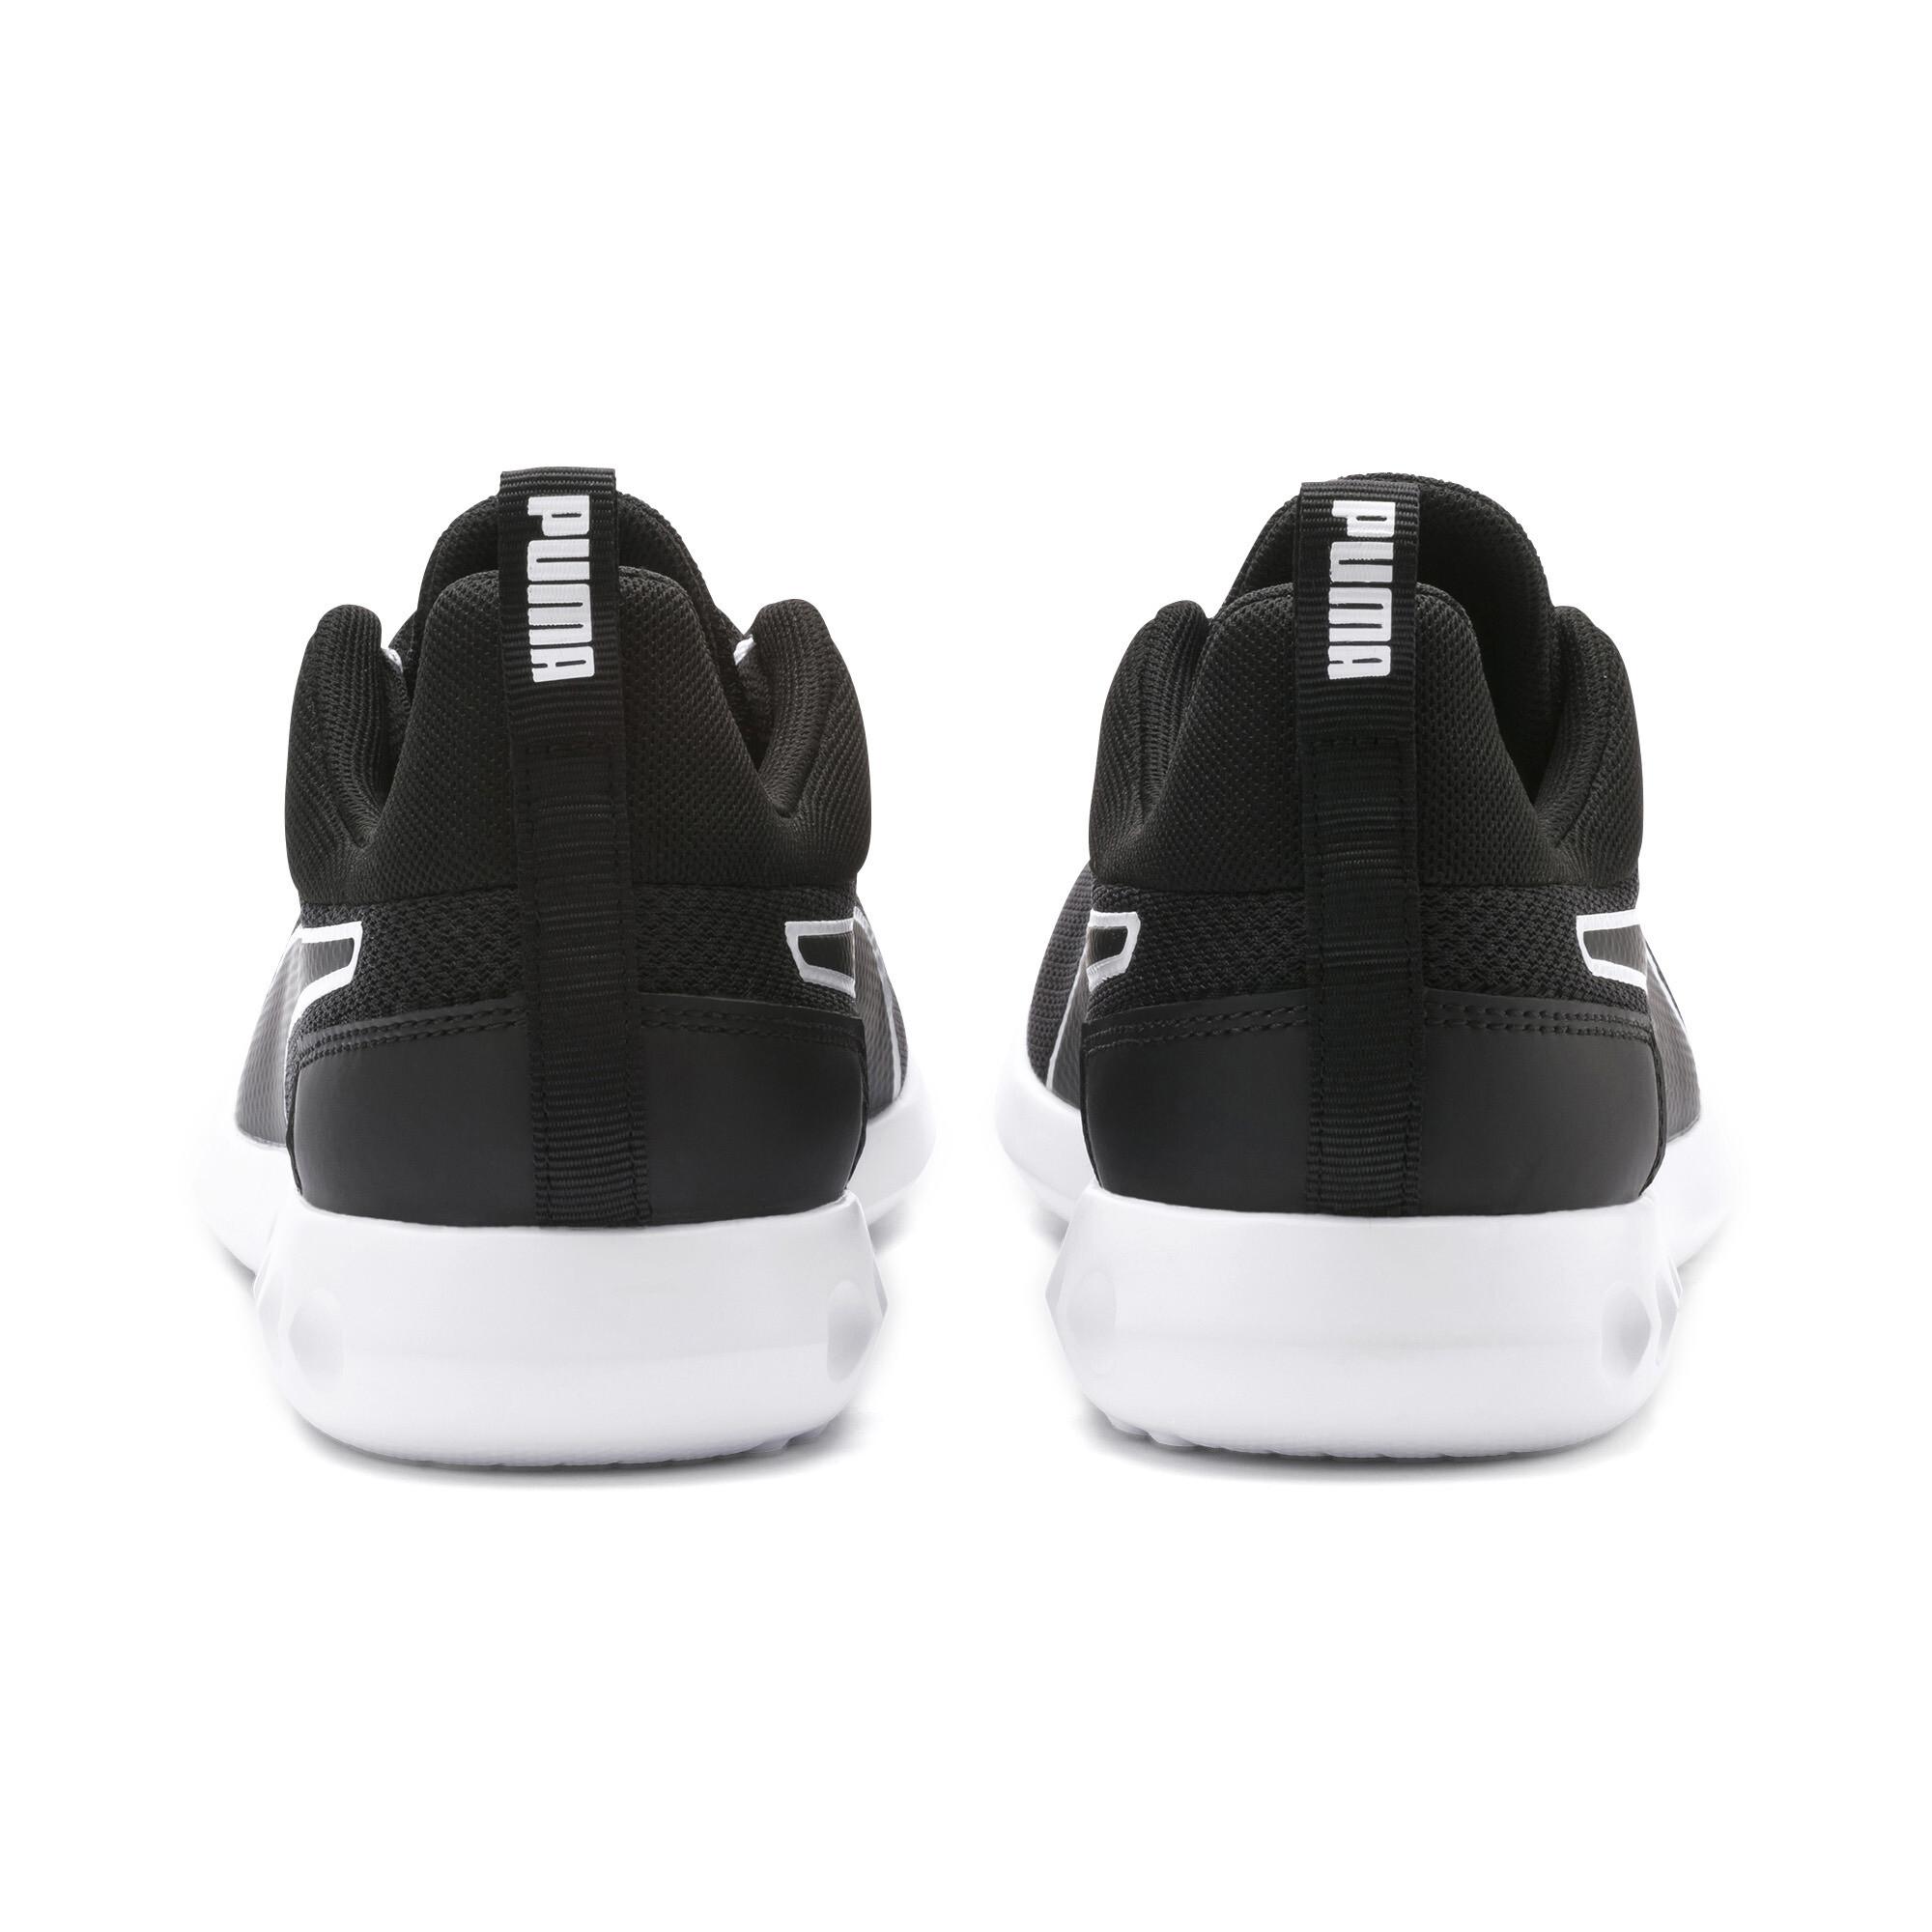 PUMA-Carson-2-Concave-Women-s-Training-Shoes-Women-Shoe-Running thumbnail 15